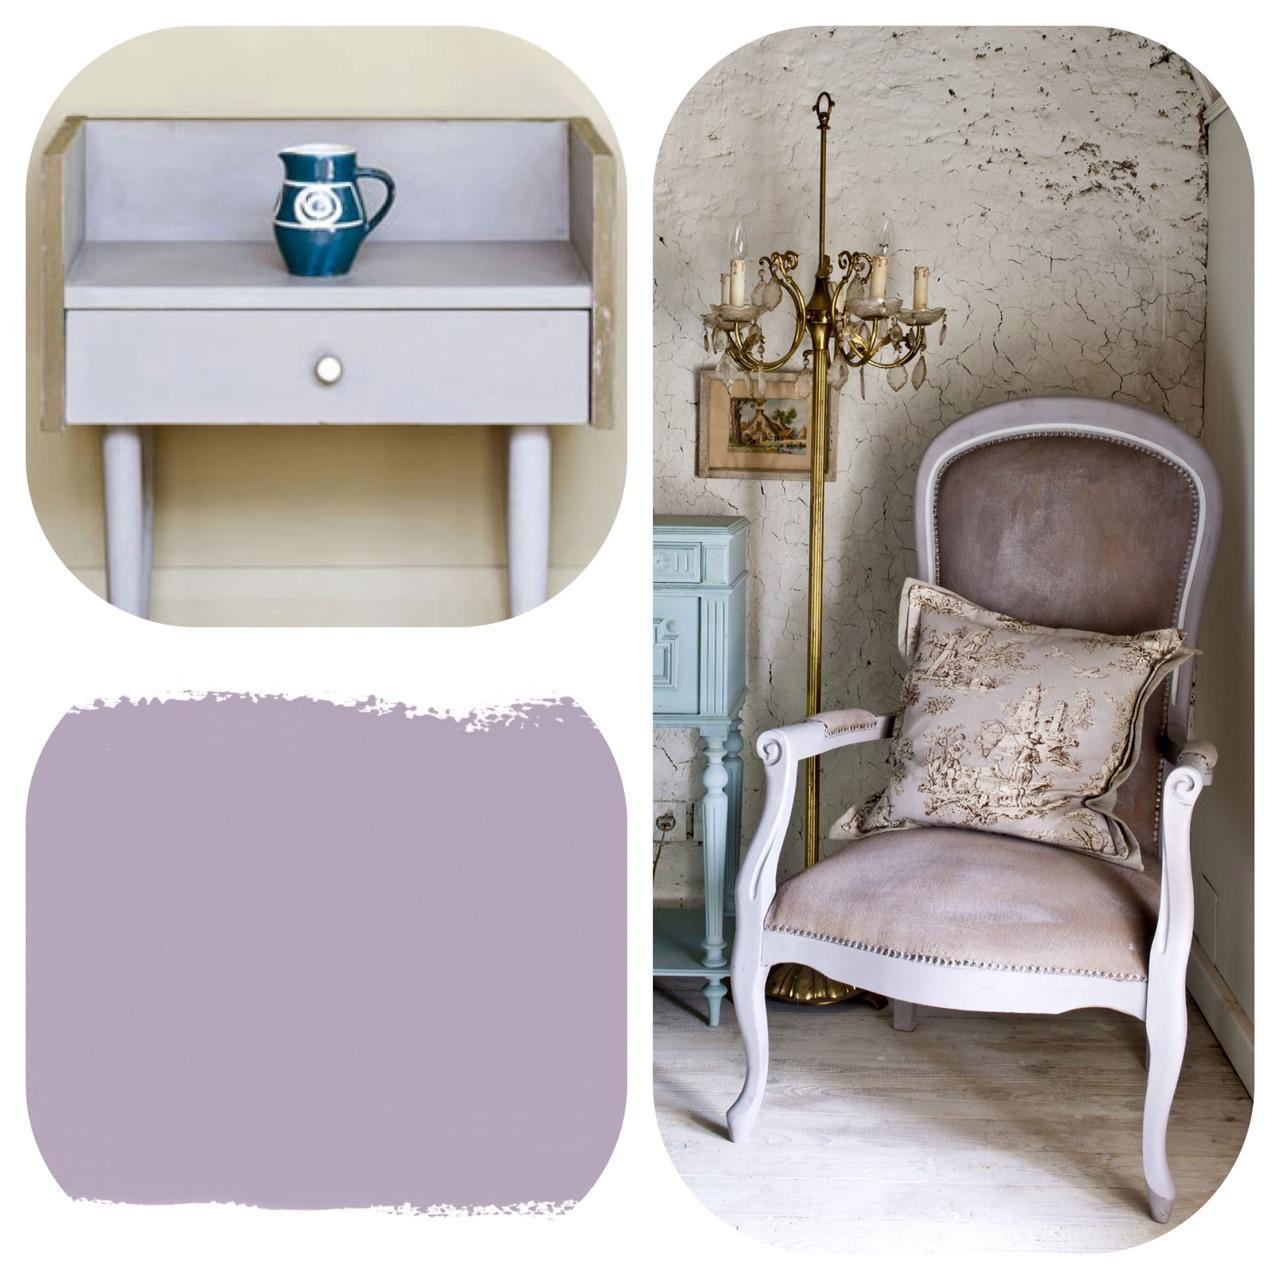 Keuken Verven Krijtverf : krijtverf kleur PALOMA: kleur van de week – Annie Sloan krijtverf